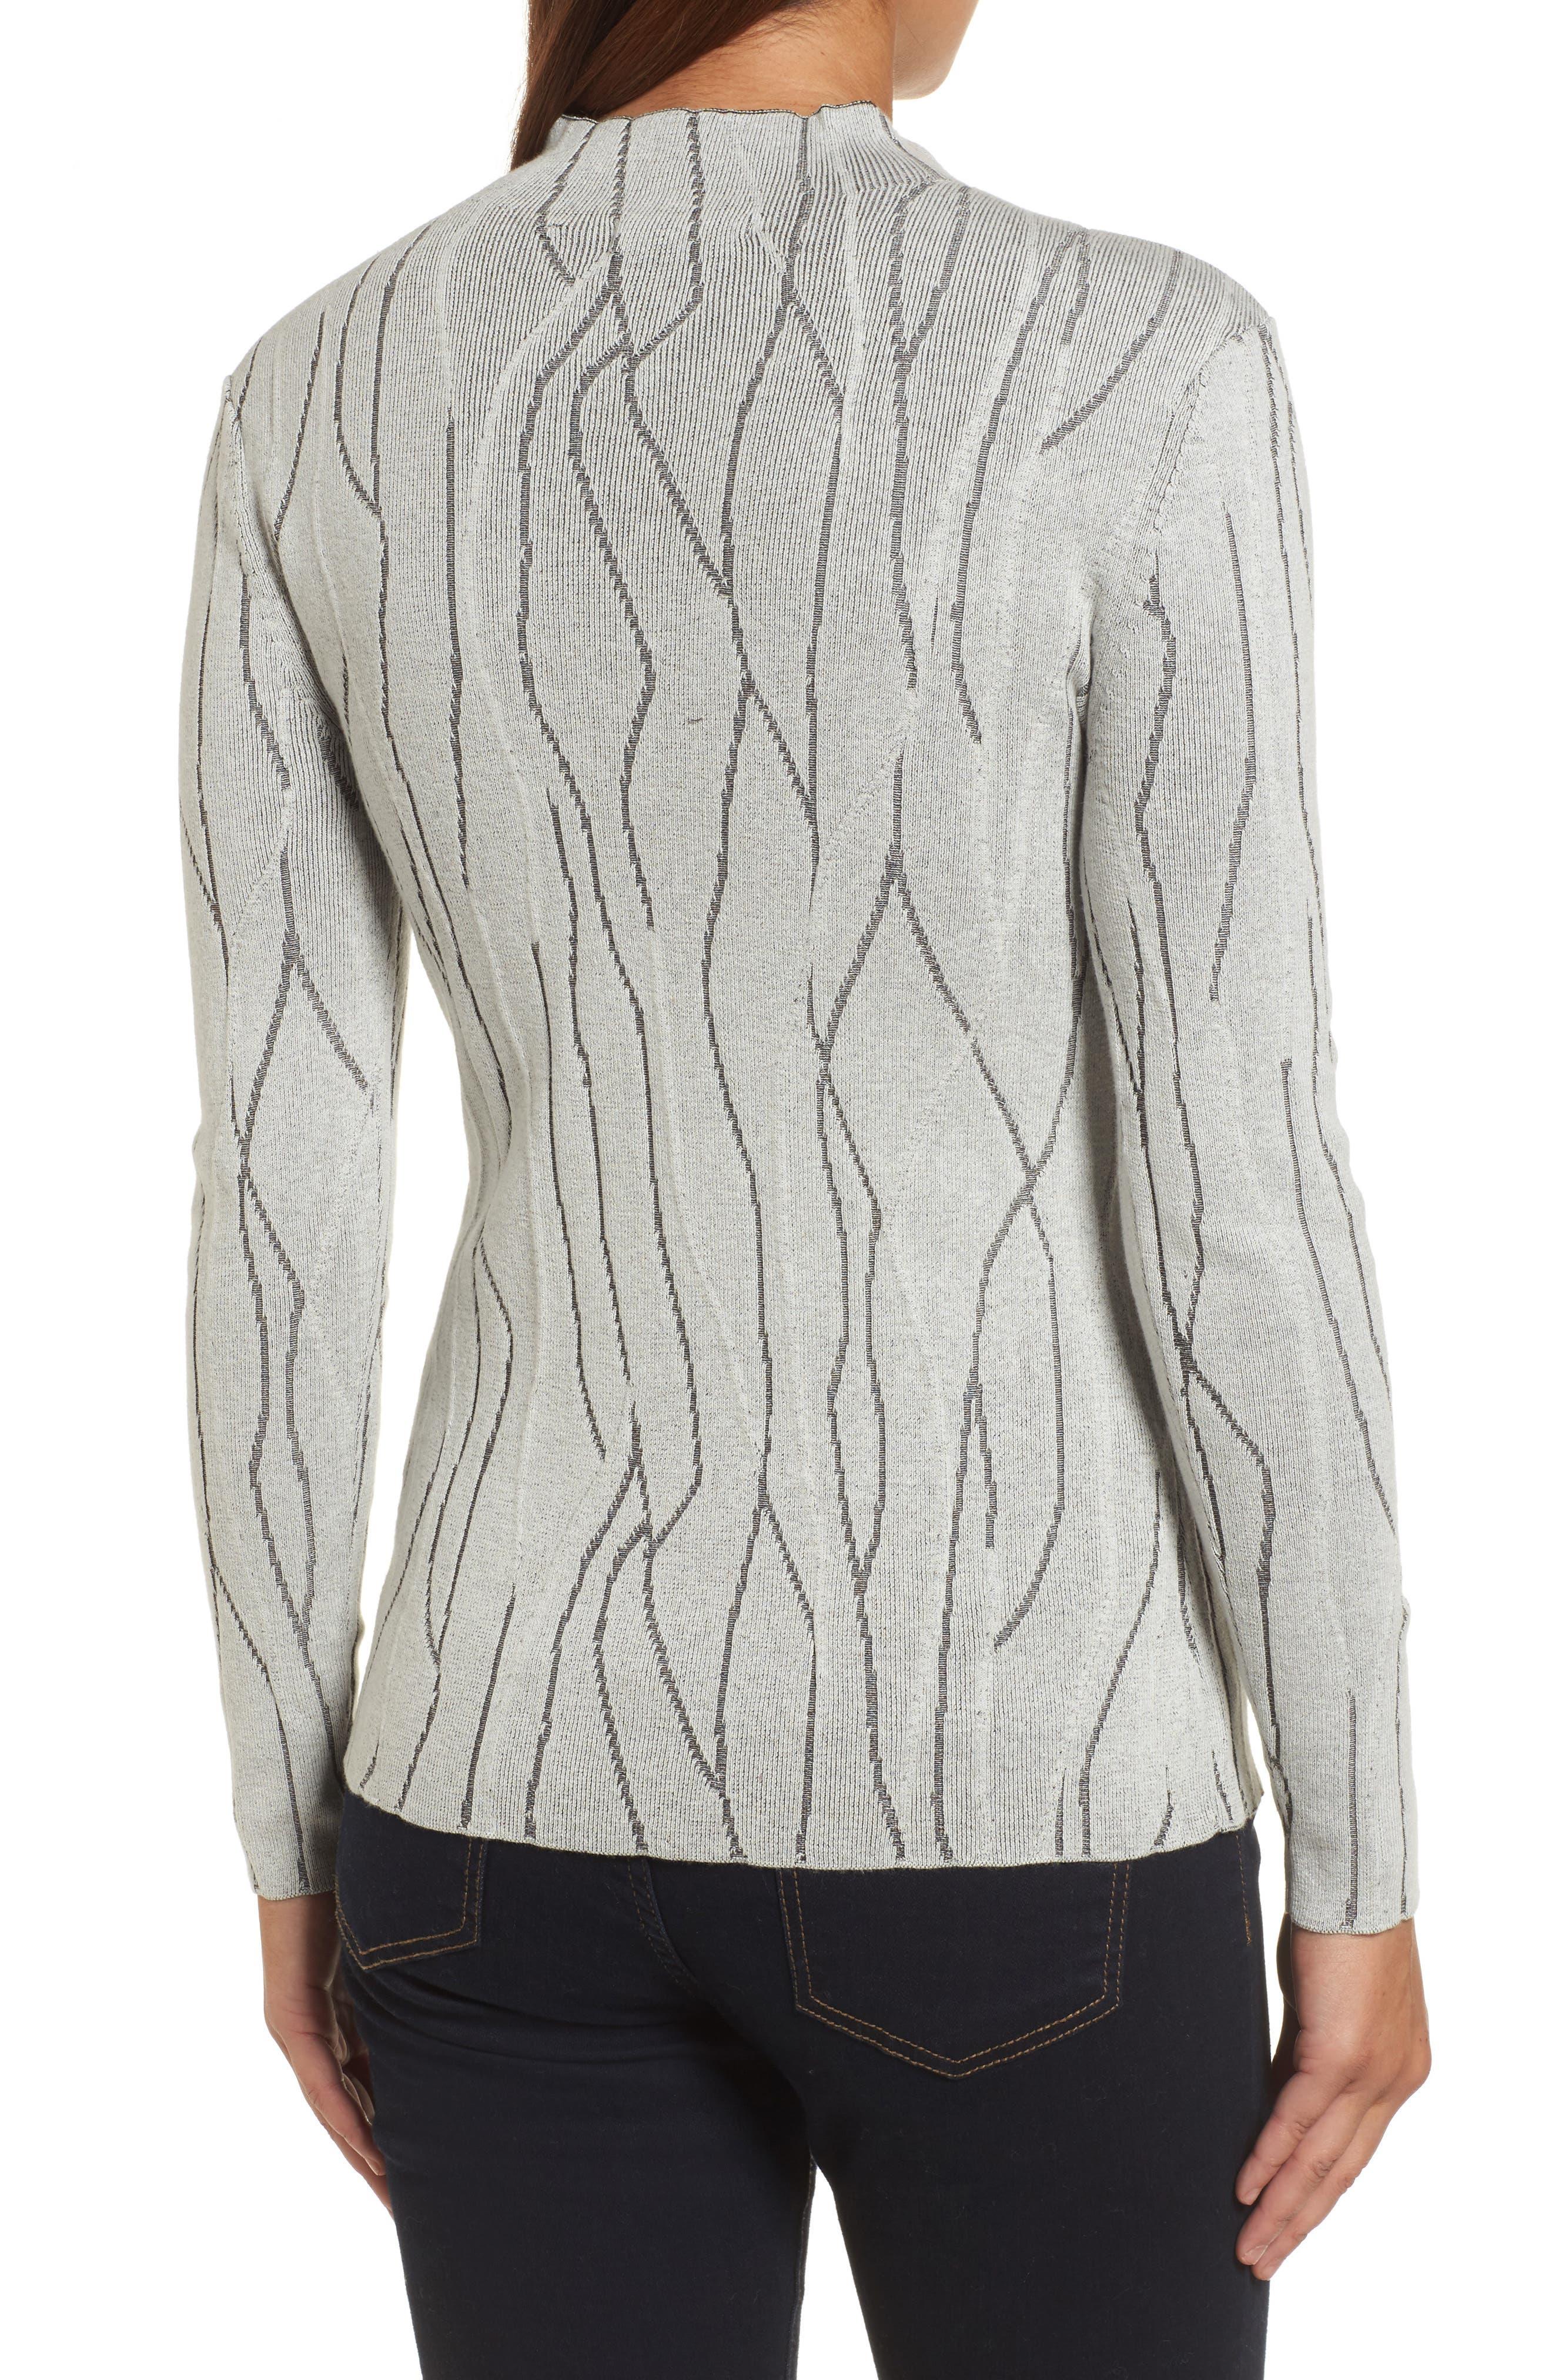 Alternate Image 2  - NIC+ZOE Artisanal Crackle Jacquard Sweater (Regular & Petite)